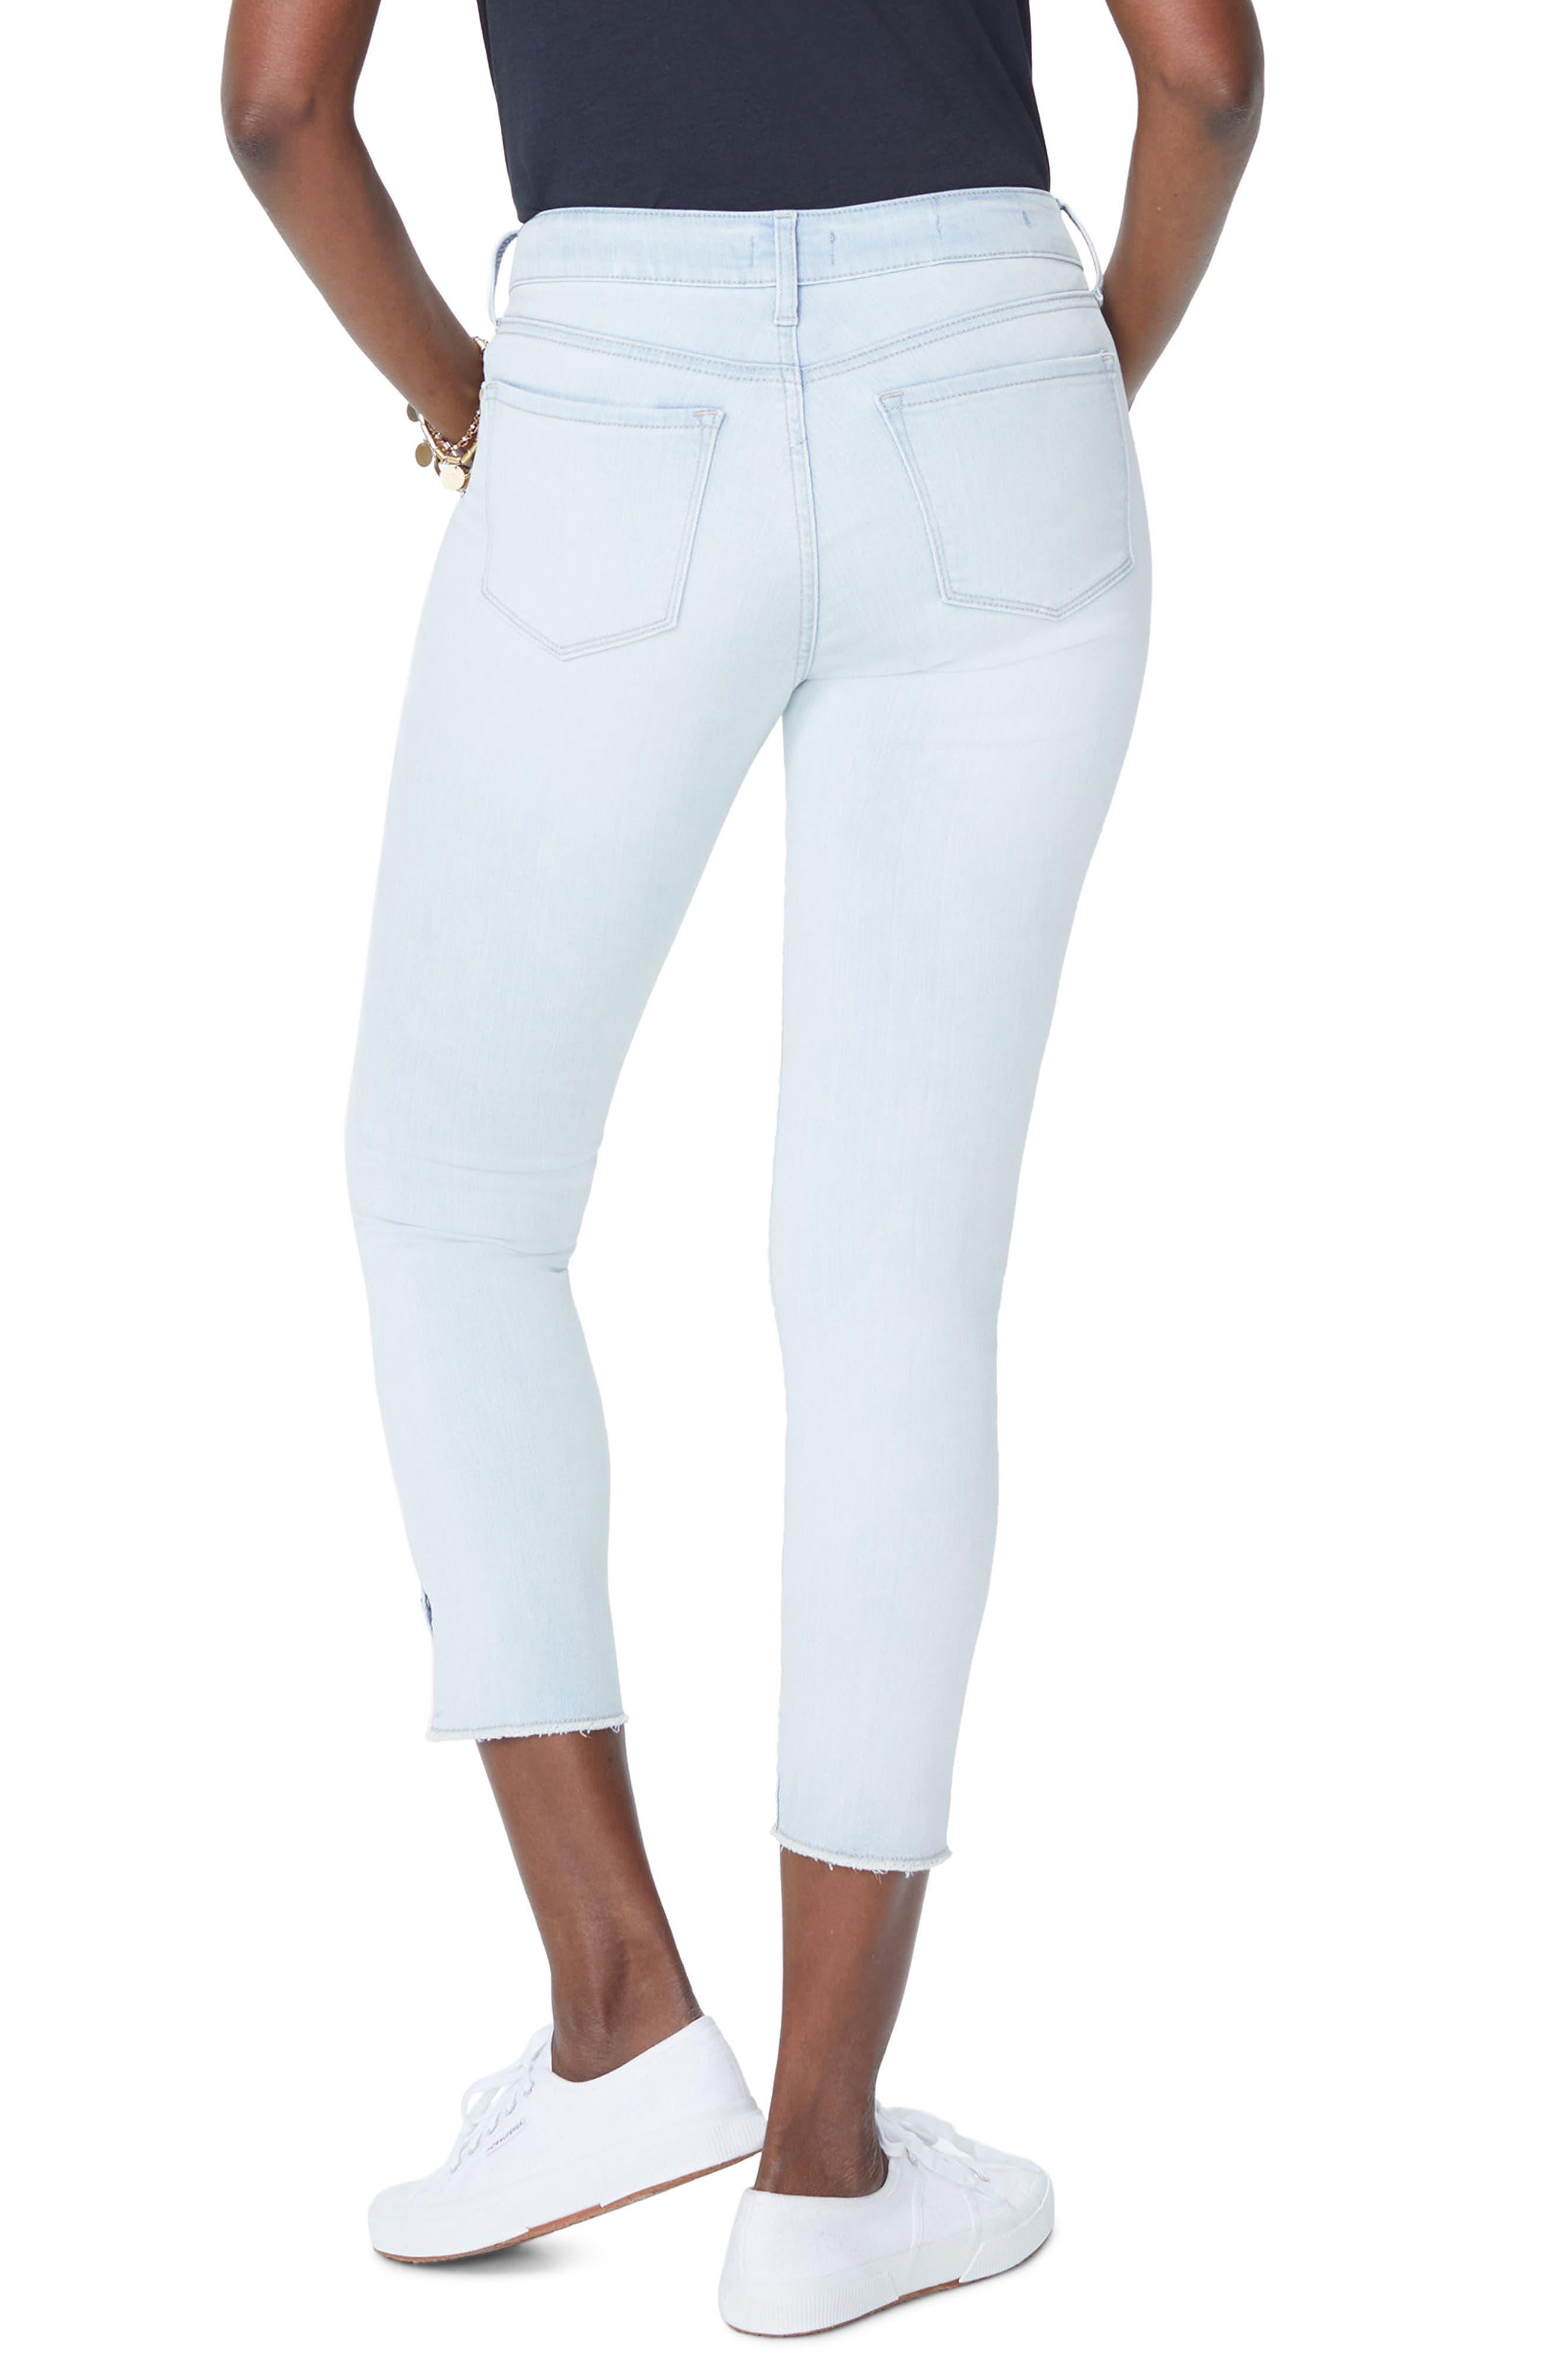 Ami Twist Seam Stretch Ankle Skinny Jeans,                             Alternate thumbnail 2, color,                             Palm Desert